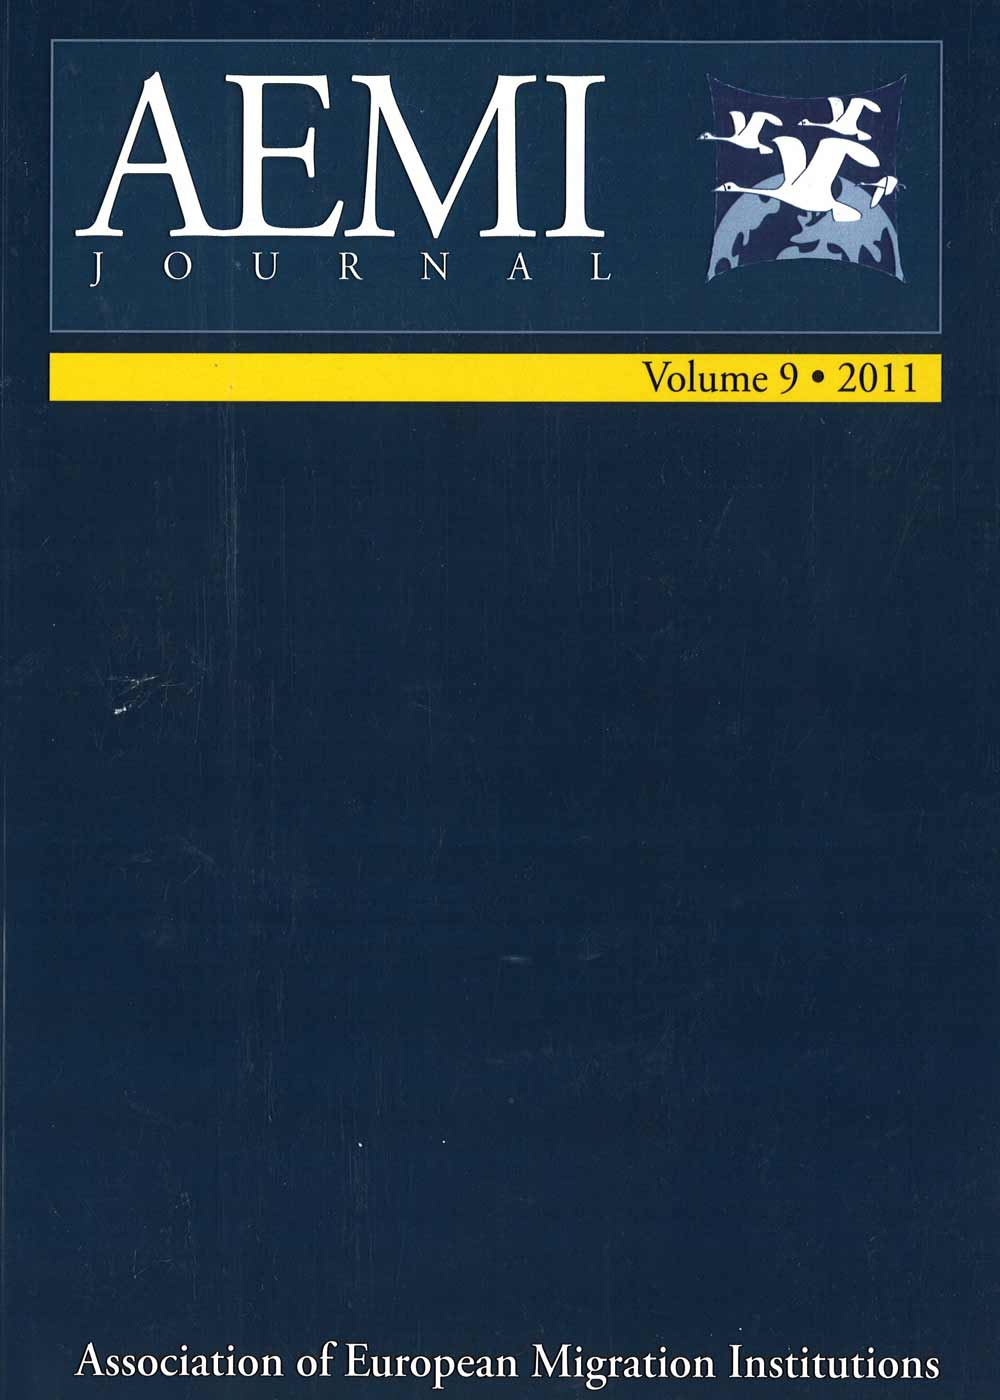 AEMI Journal – Volume 9 (2011)